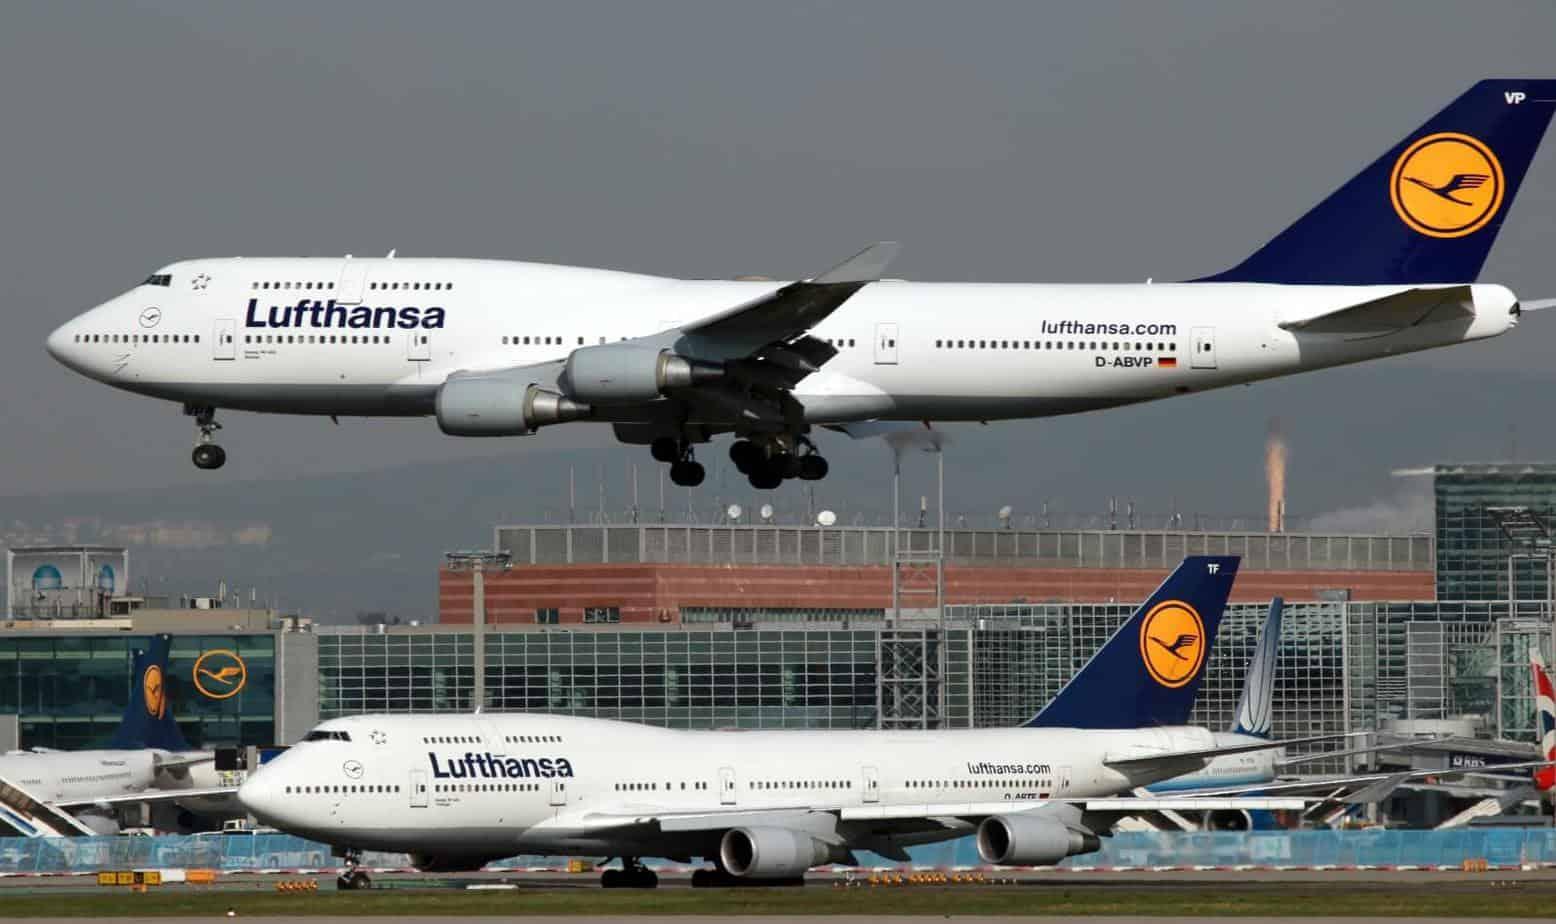 A Lufthansa Boeing 747 on approach to Frankfurt International Airport